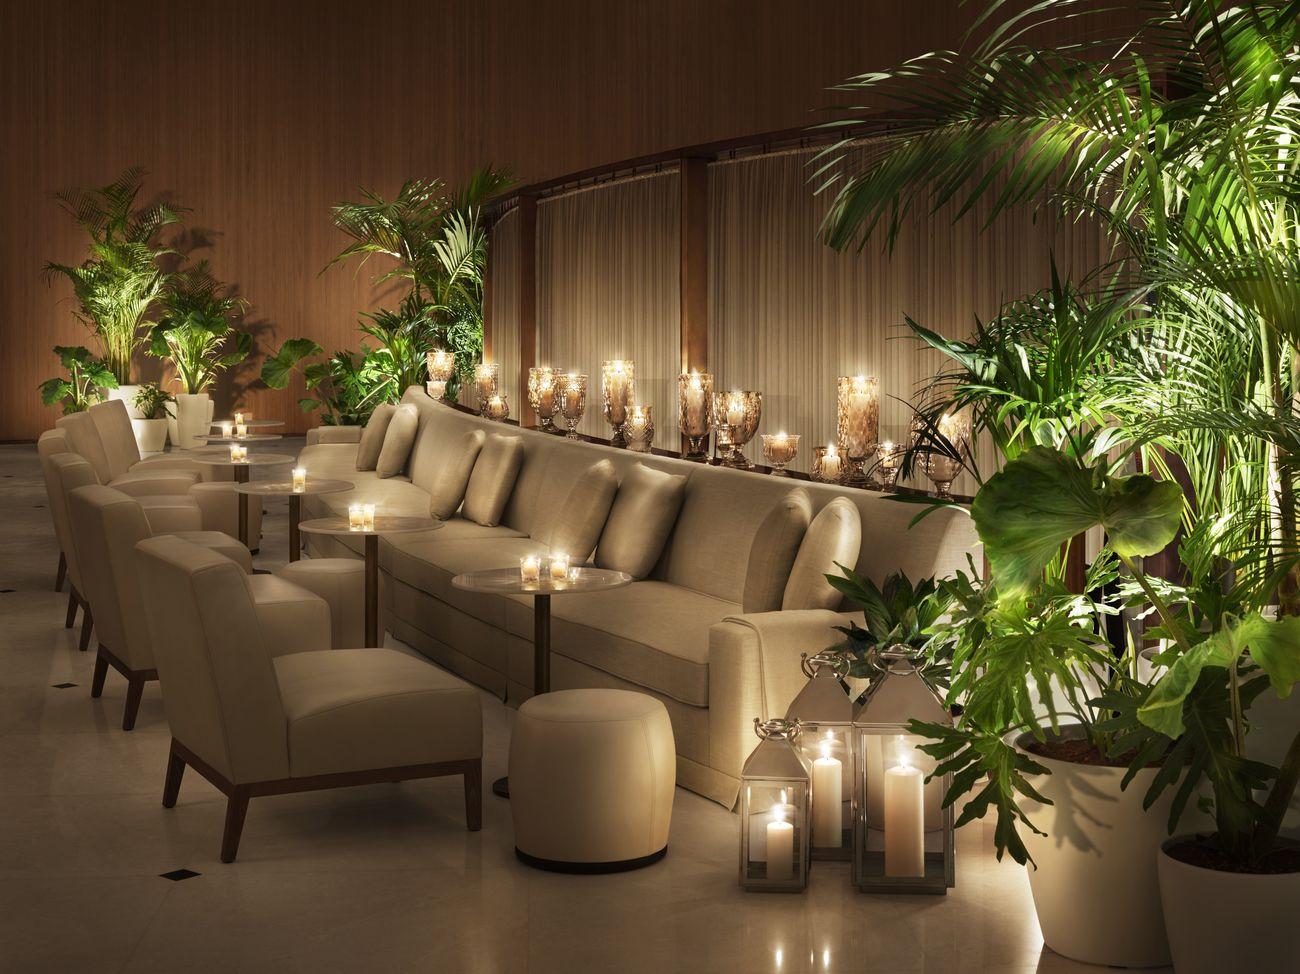 The Abu Dhabi EDITION Lobby. Courtesy of EDITION Hotels